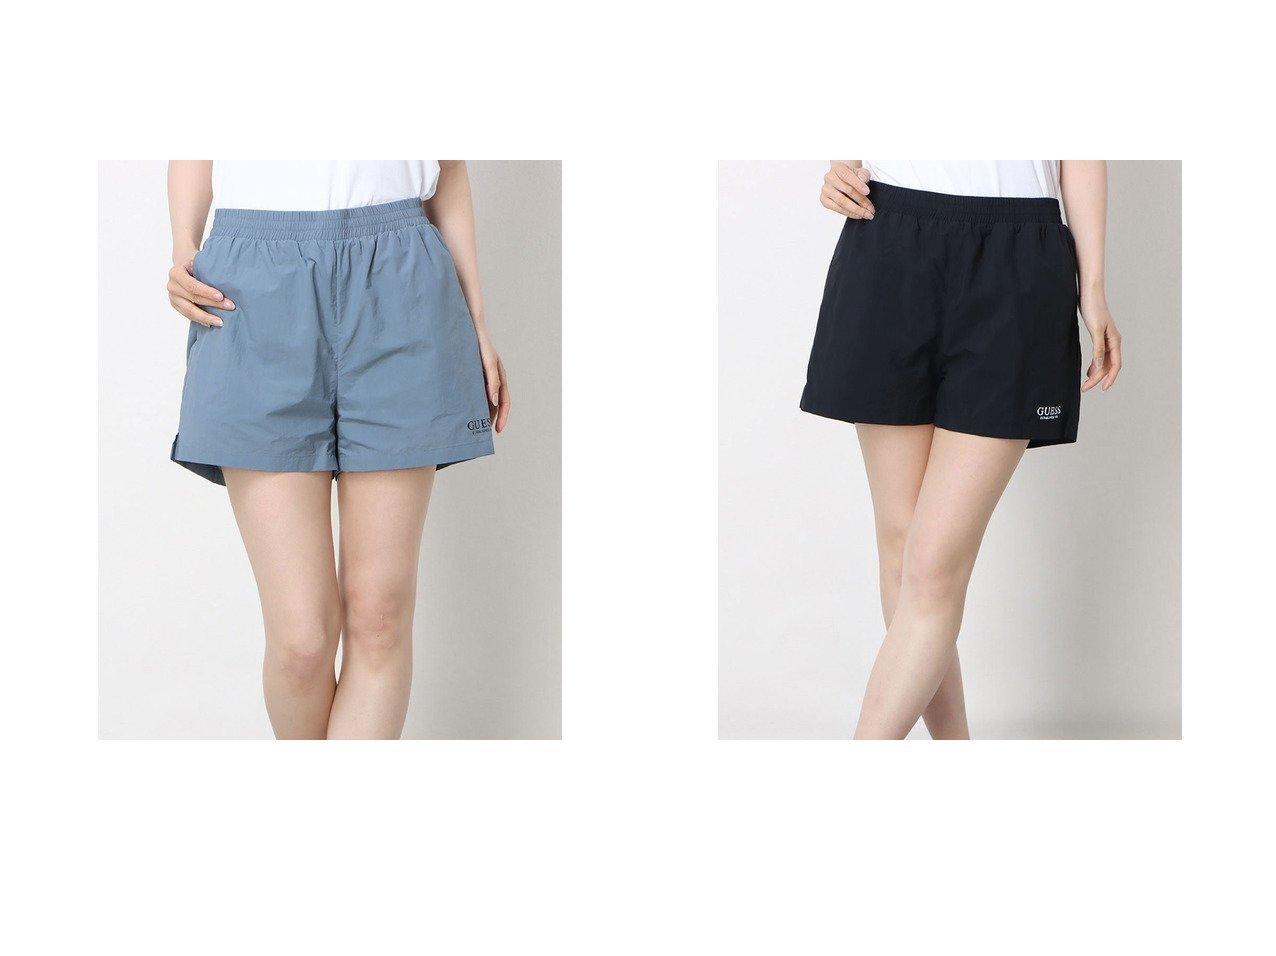 【GUESS/ゲス】のLogo Nylon Shorts おすすめ!人気トレンド・レディースファッション通販 おすすめで人気の流行・トレンド、ファッションの通販商品 インテリア・家具・メンズファッション・キッズファッション・レディースファッション・服の通販 founy(ファニー) https://founy.com/ ファッション Fashion レディースファッション WOMEN 2021年 2021 2021春夏・S/S SS/Spring/Summer/2021 S/S・春夏 SS・Spring/Summer ショート ジャケット セットアップ ドローストリング フィット 夏 Summer 春 Spring |ID:crp329100000046824